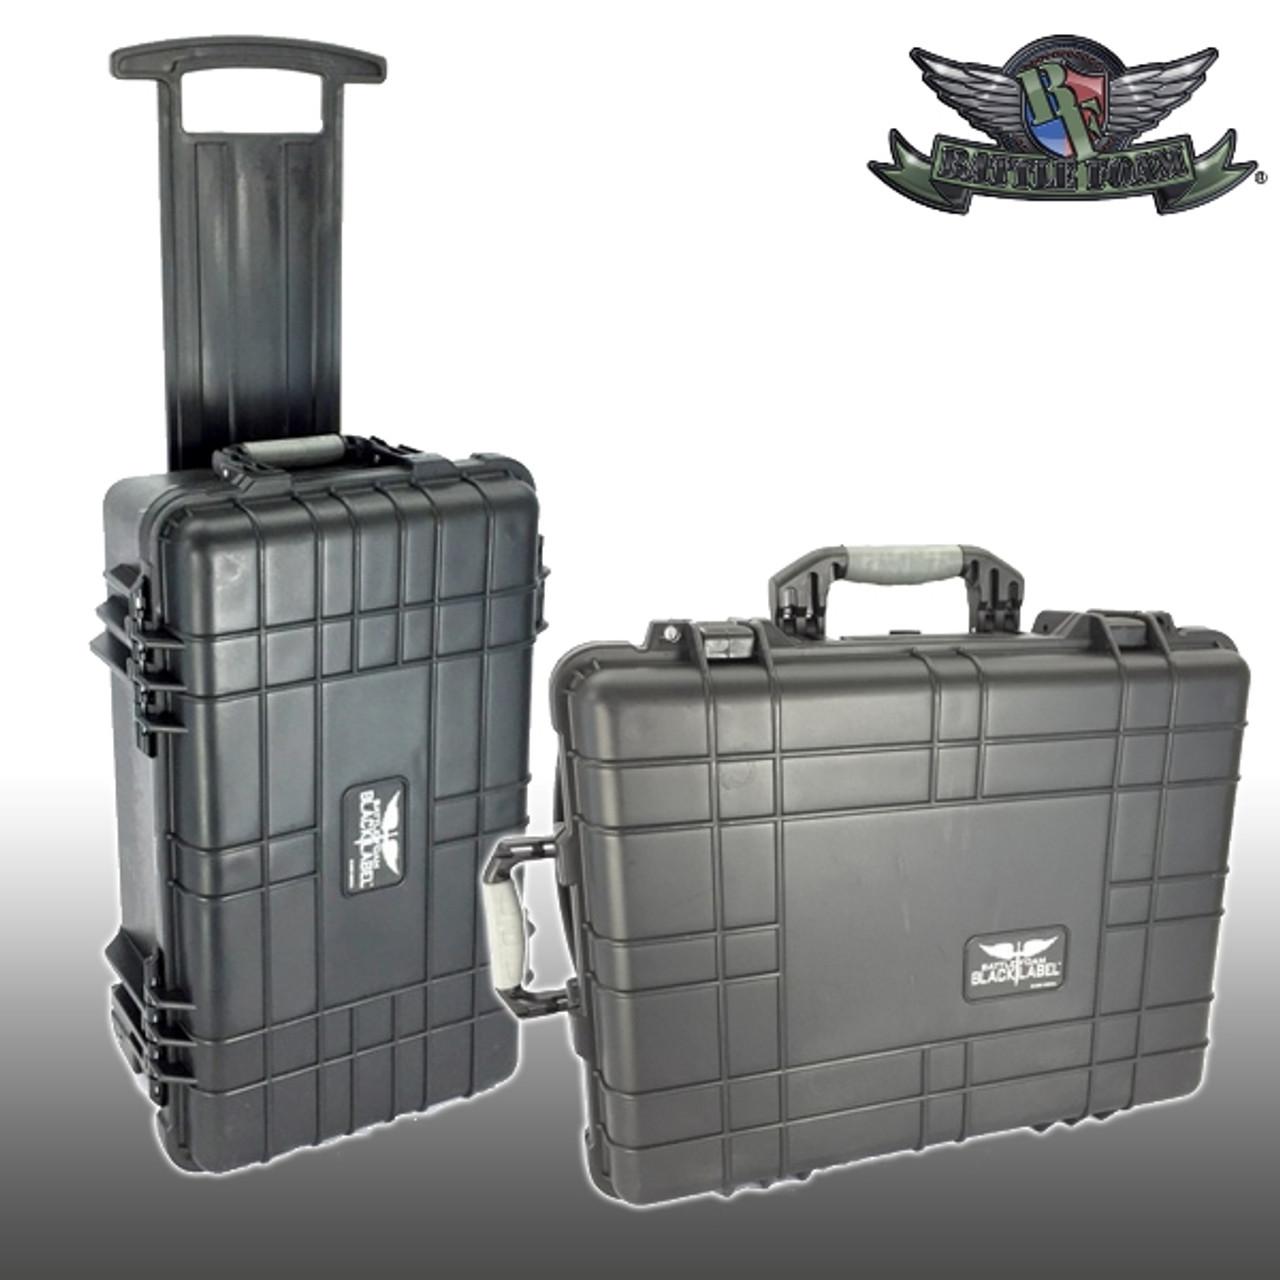 Black Label Hard Case Traveler S Pack Battle Foam @battle foam provides the best foam and case storage for protecting your miniatures. black label hard case traveler s pack